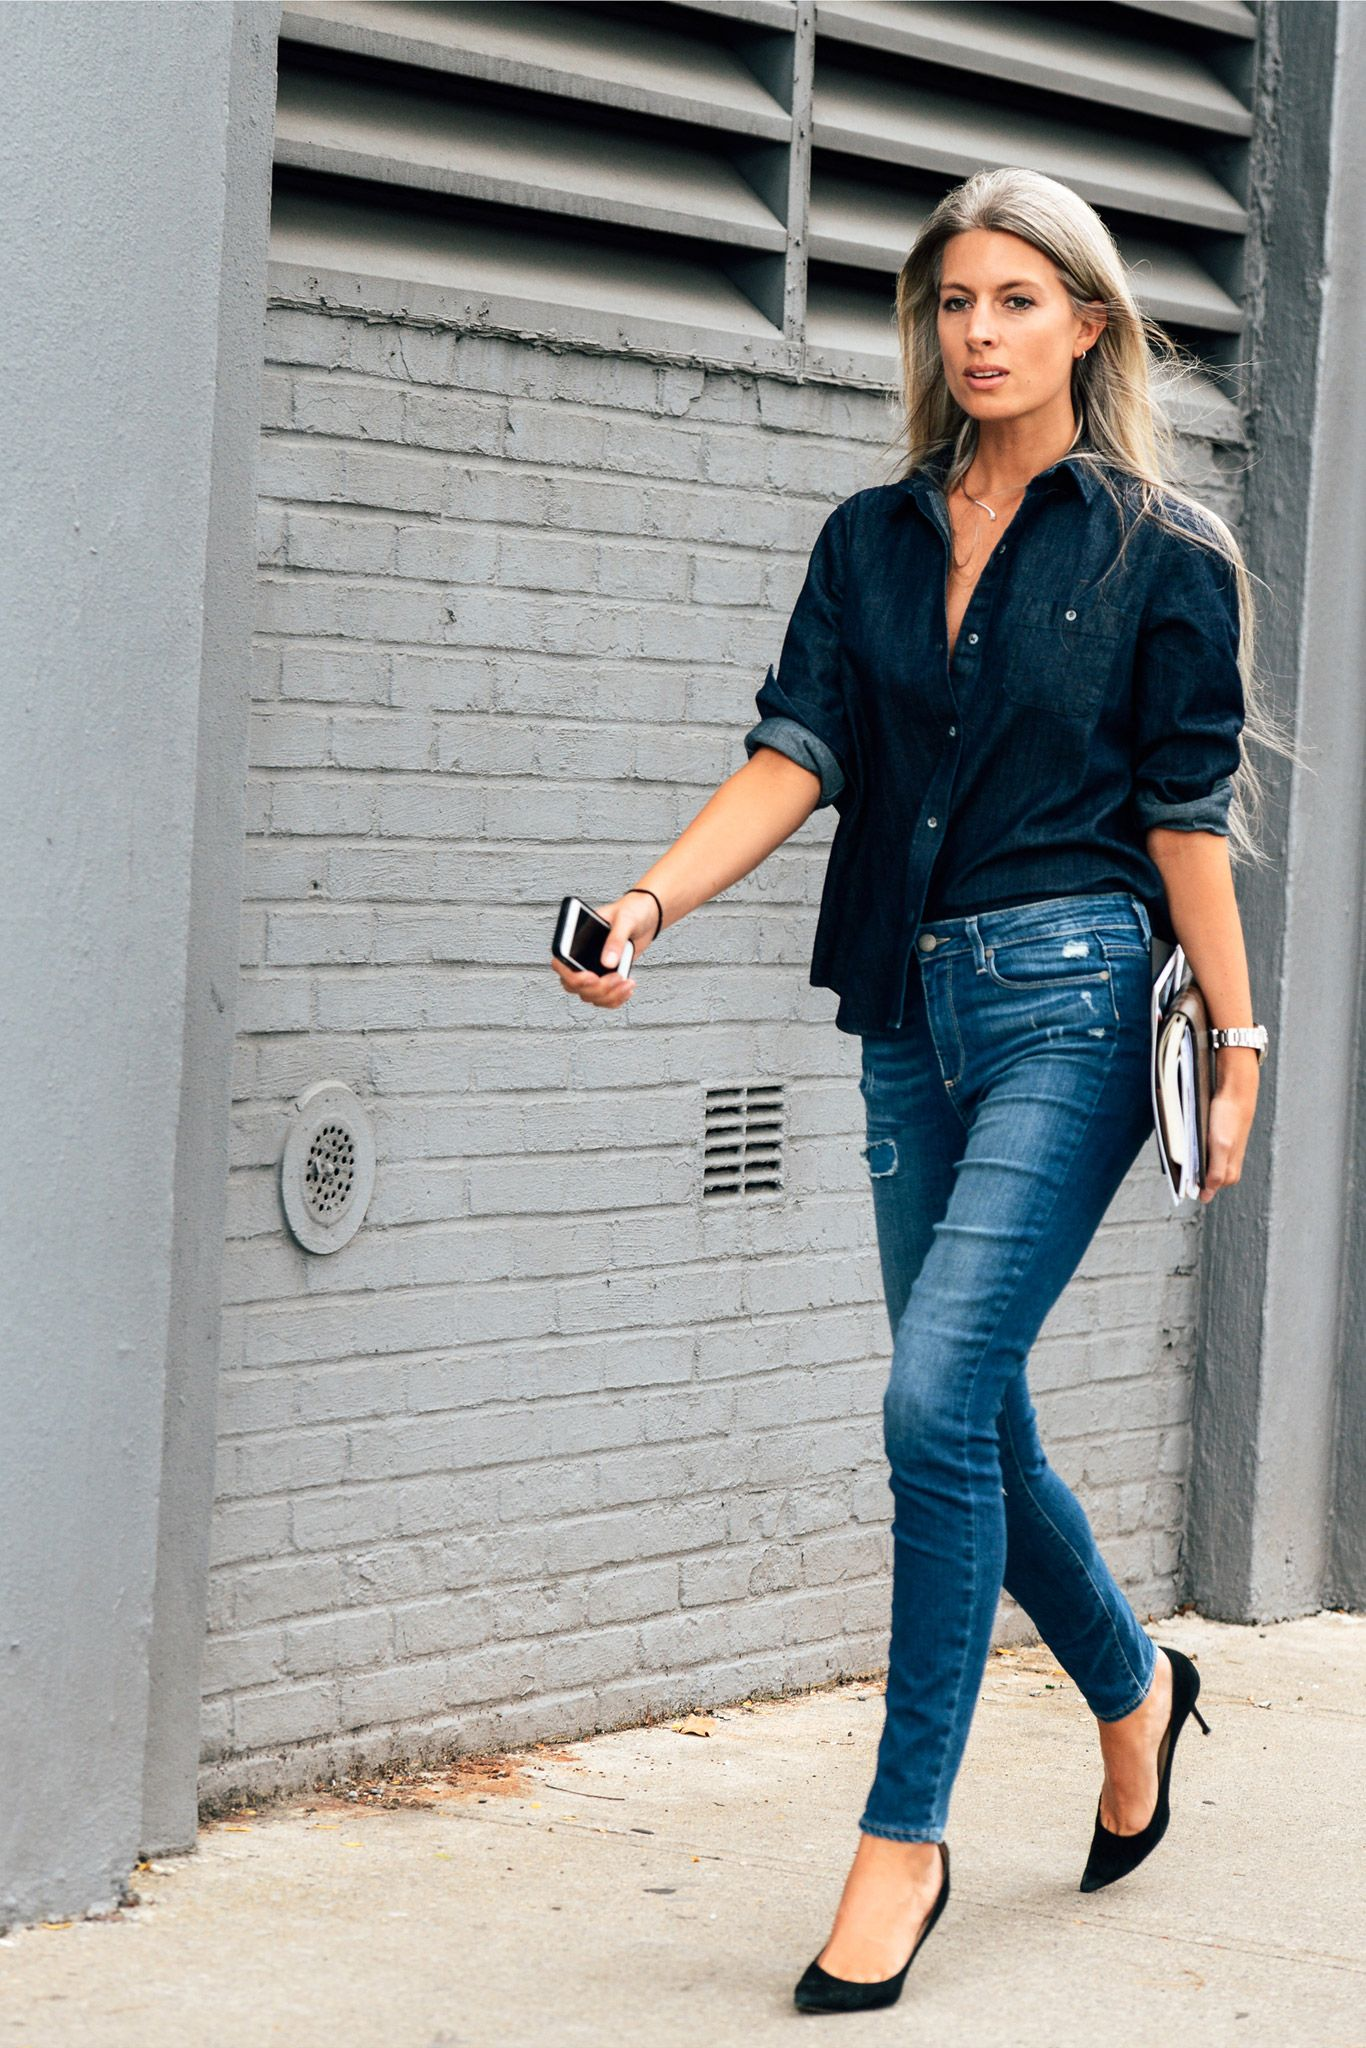 tenue chemise en jean bleu marine jean skinny d chir bleu escarpins en daim noirs fashion. Black Bedroom Furniture Sets. Home Design Ideas